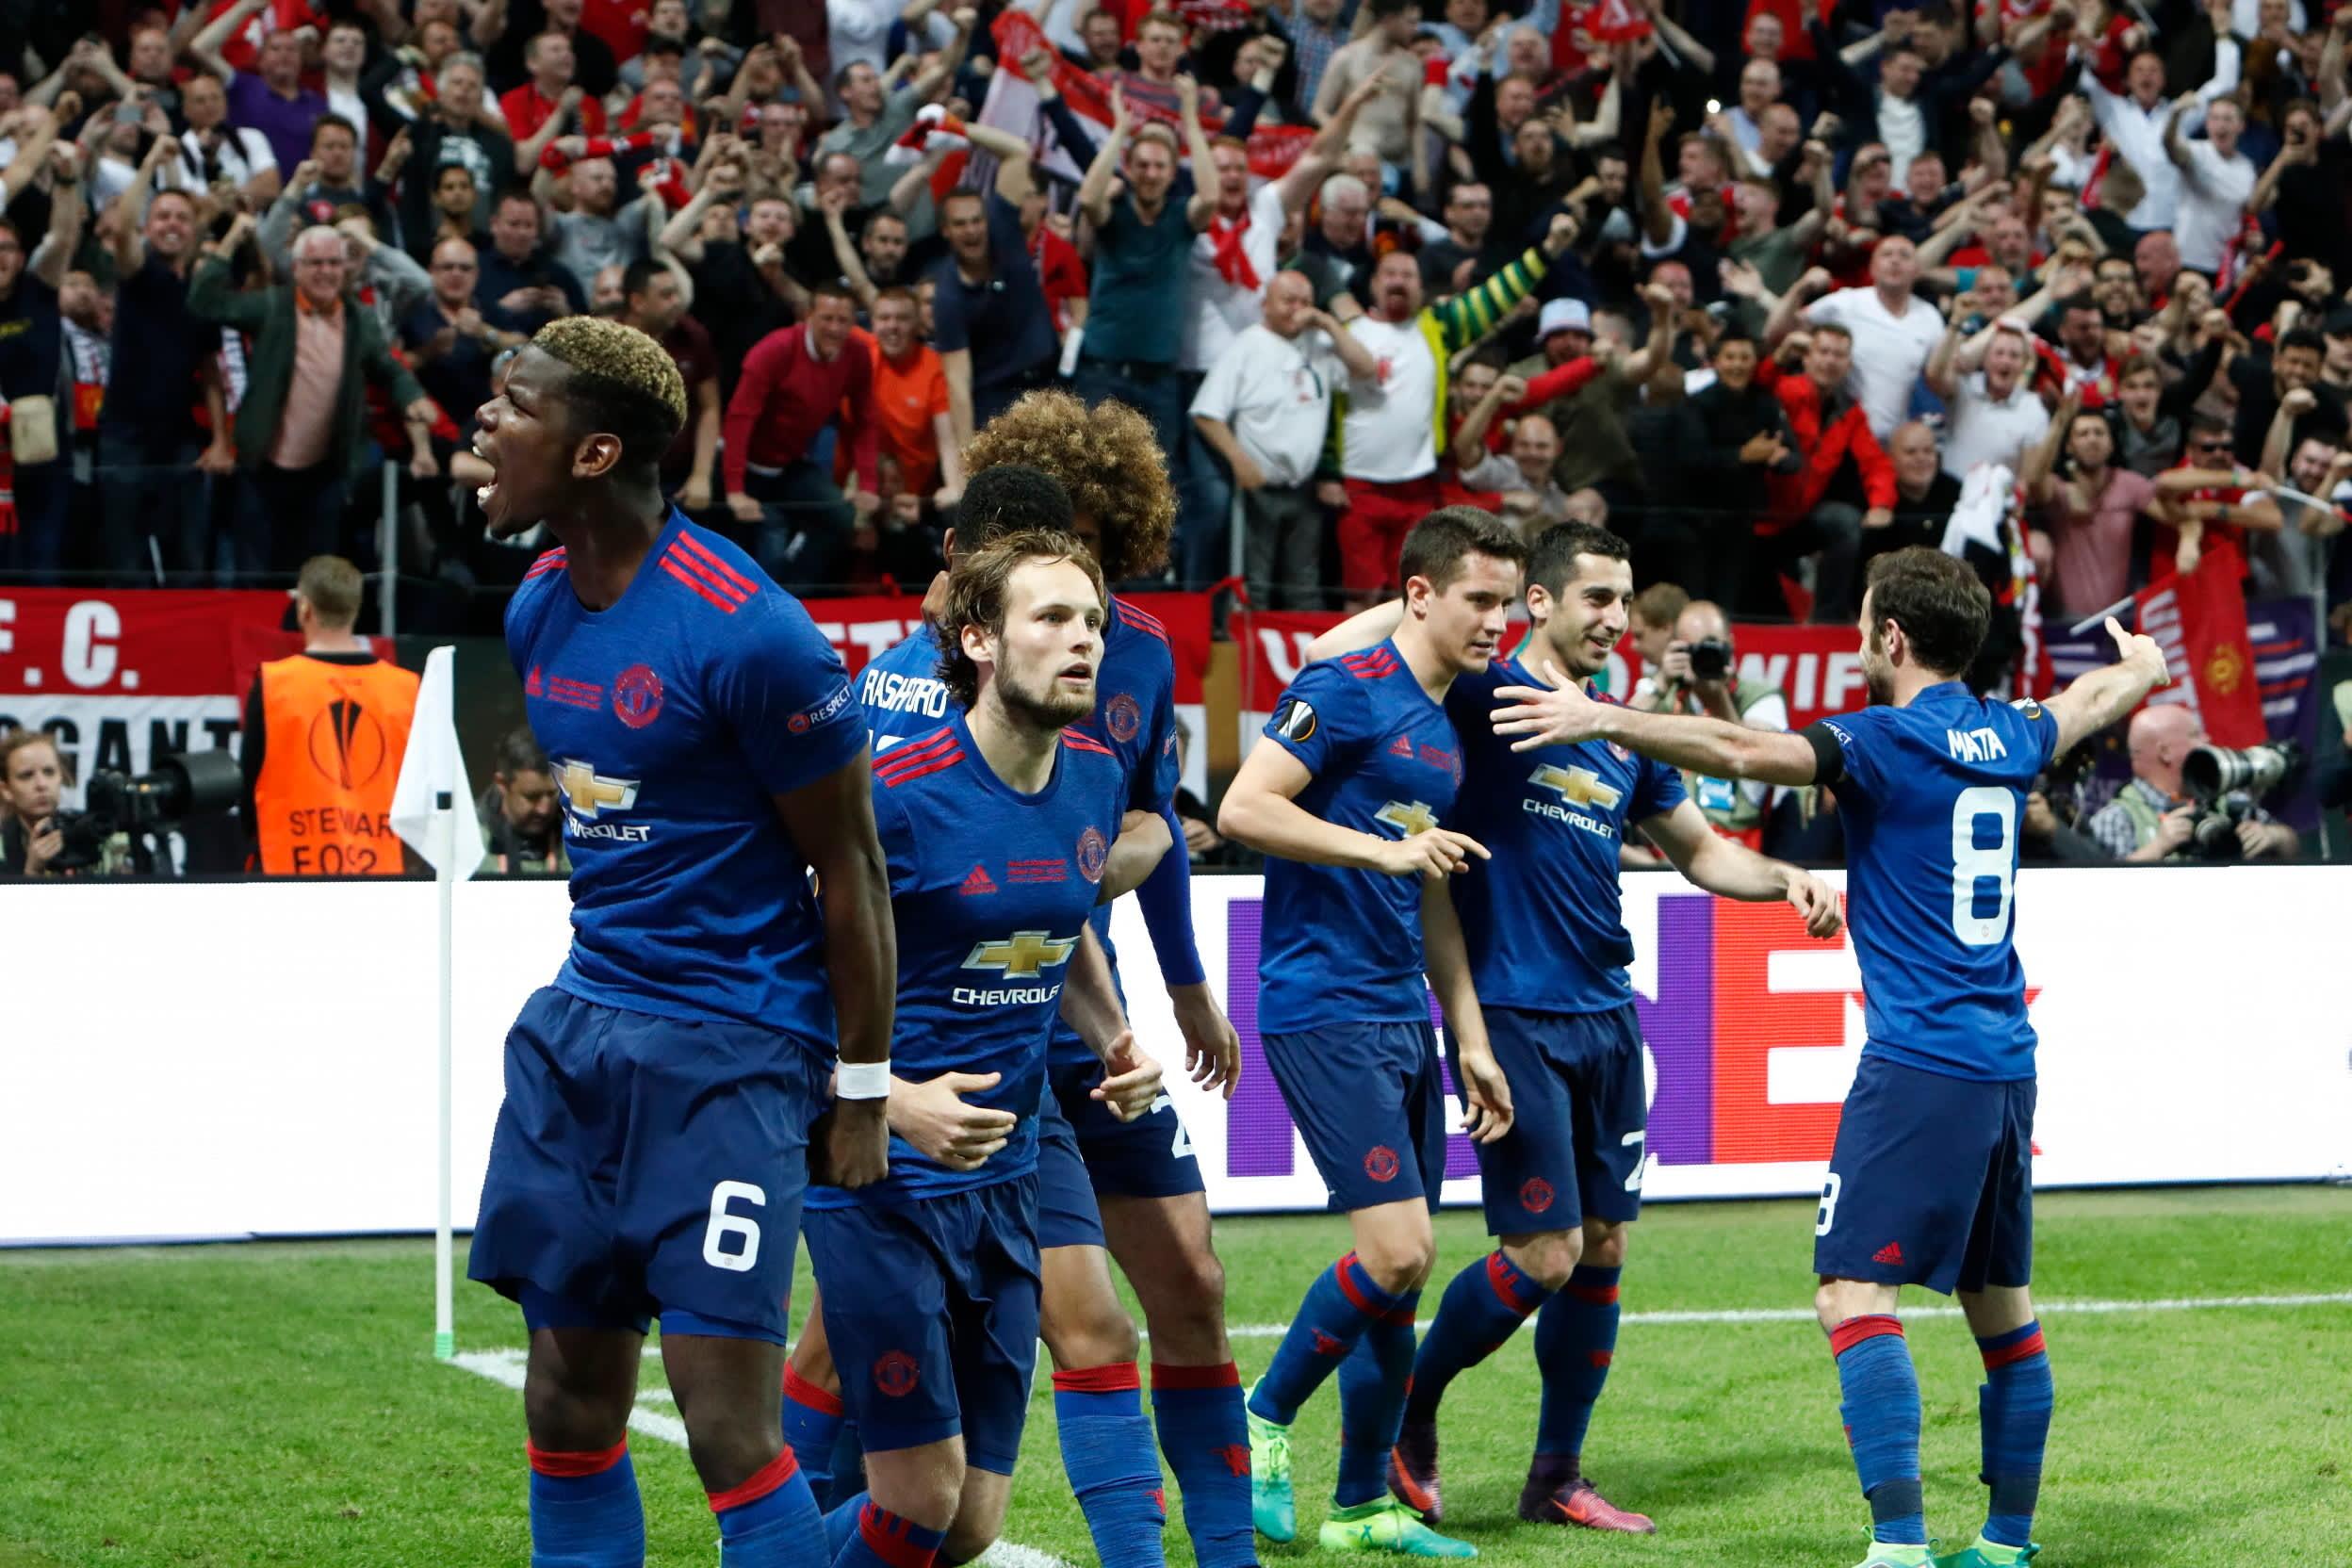 Manchester United juhli voittoa railakkaasti.